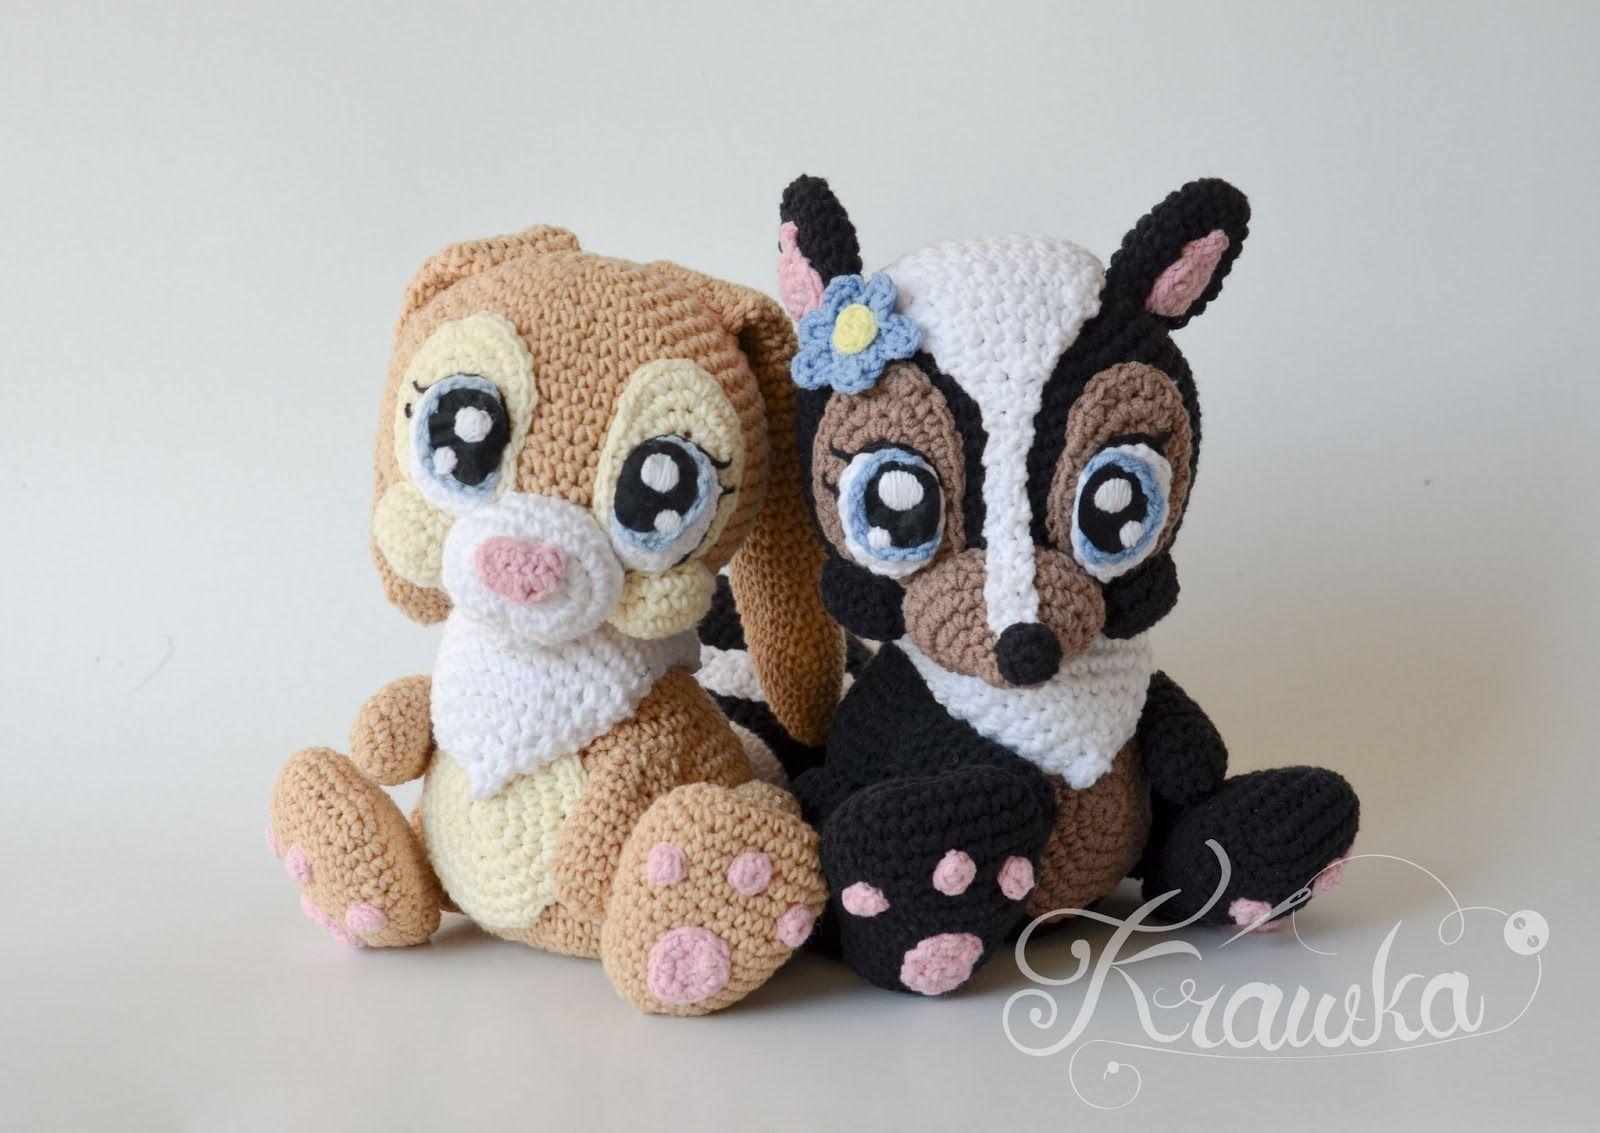 Krawka: Miss Bunny and Skunk Flower - disney bambi inspired crochet ...